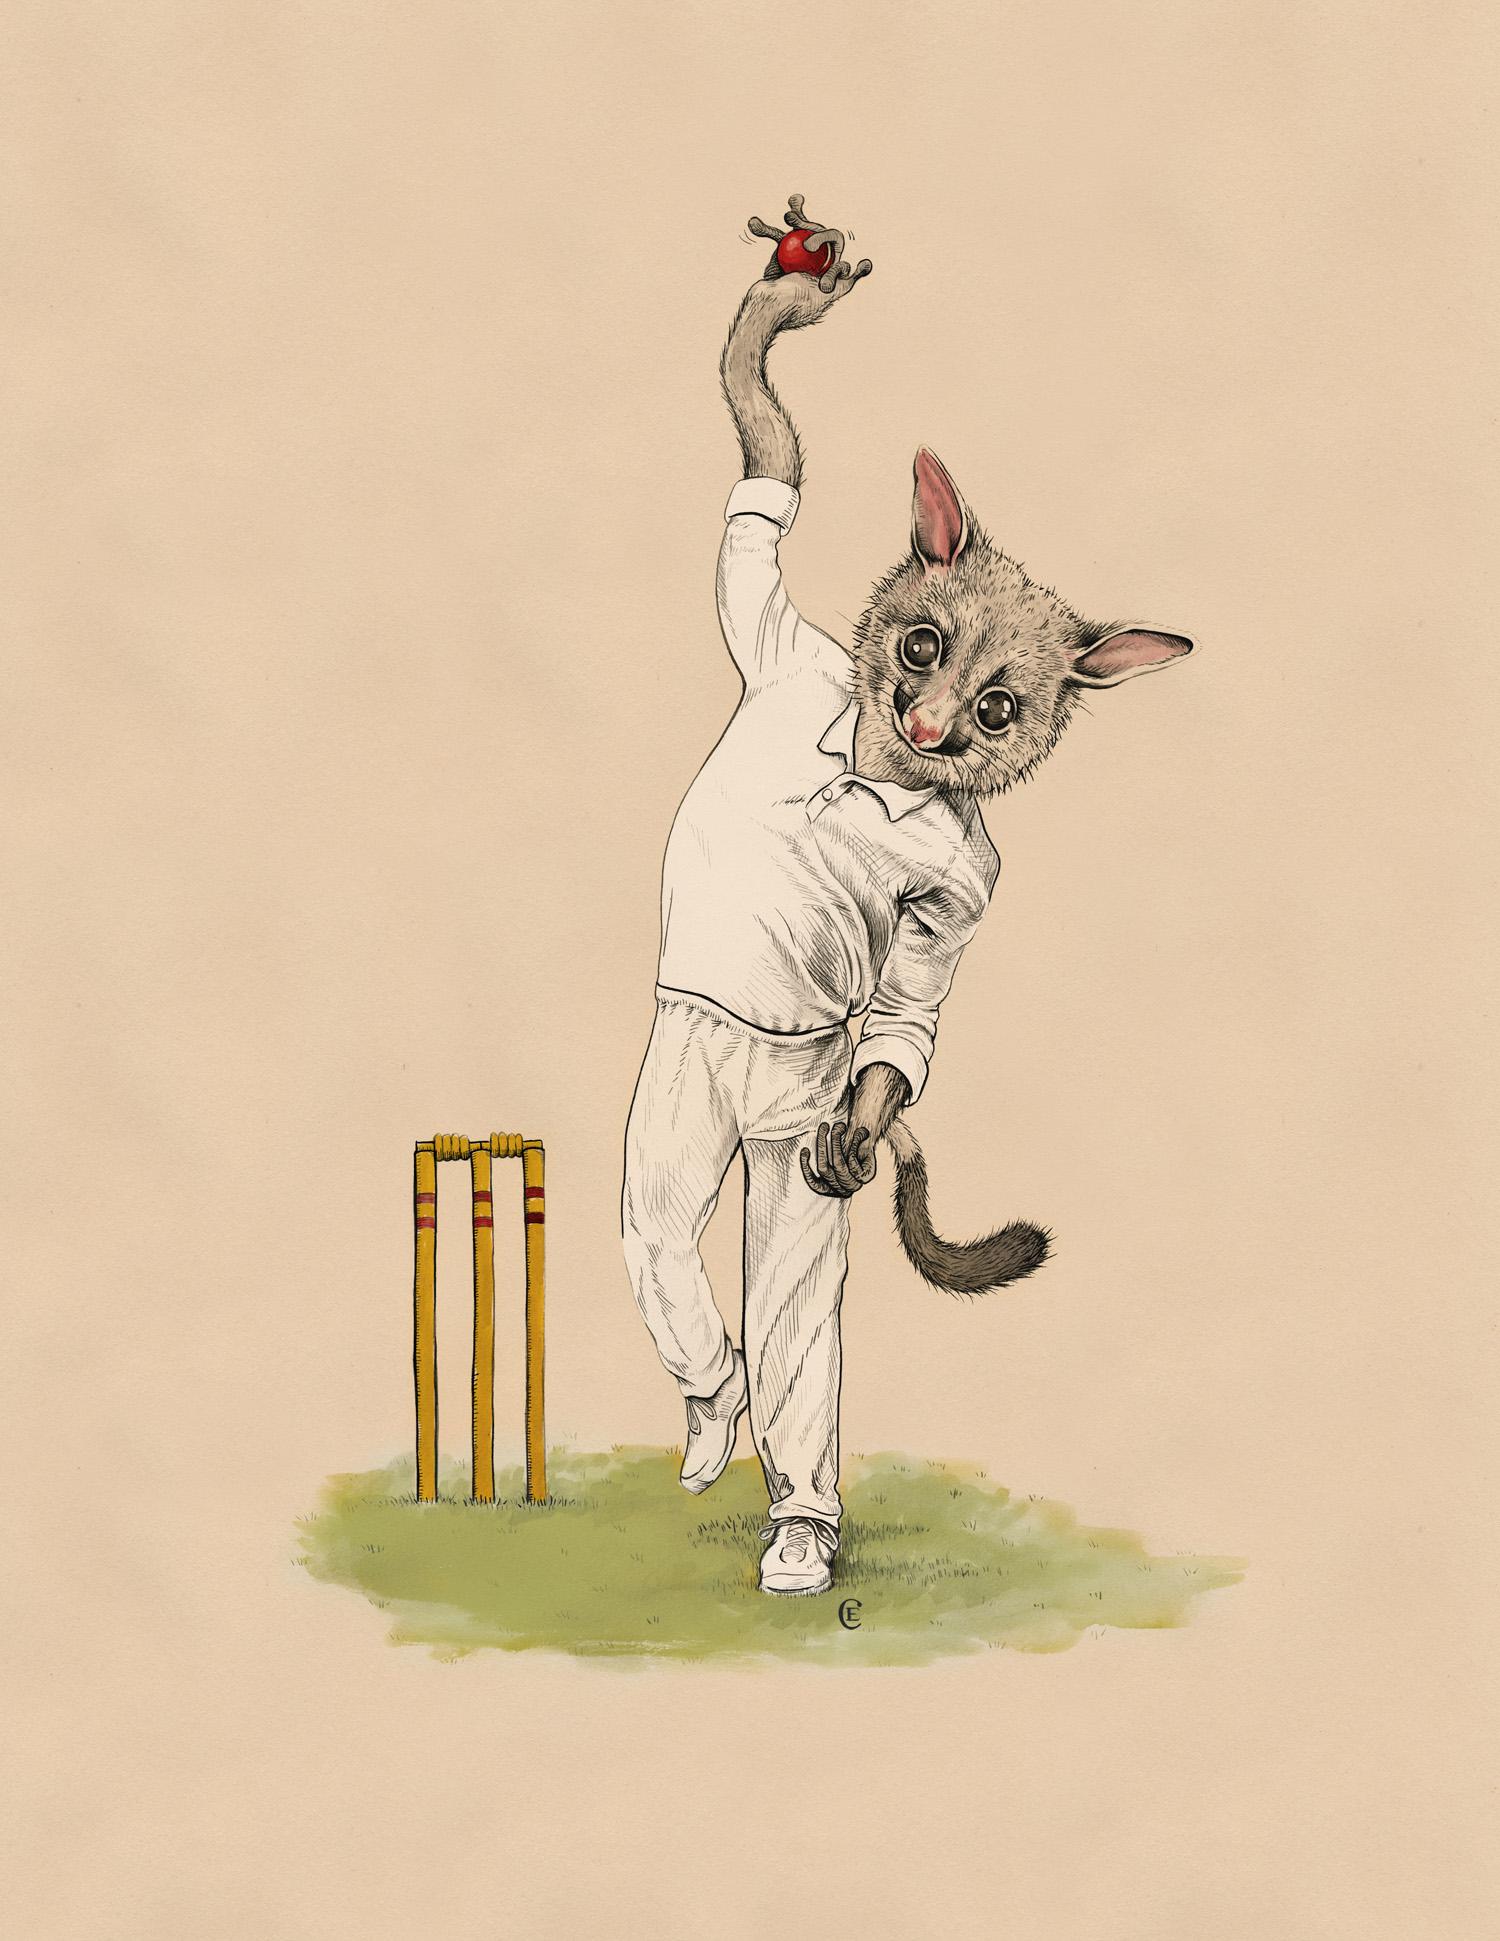 possum-spin-bowler-cricket.jpg